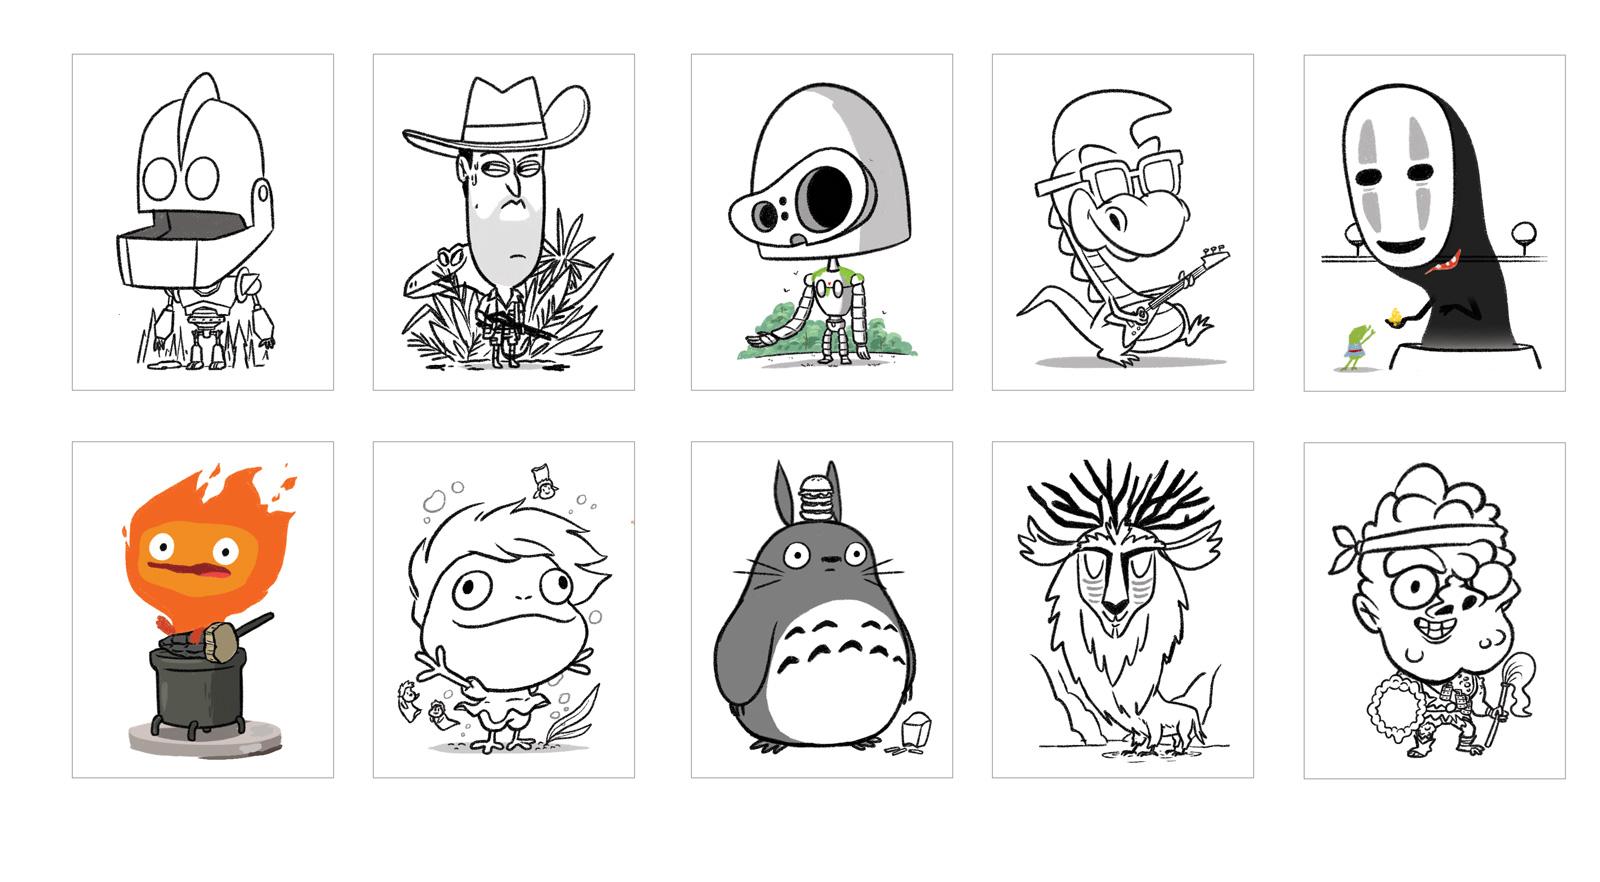 sketches_08.jpg